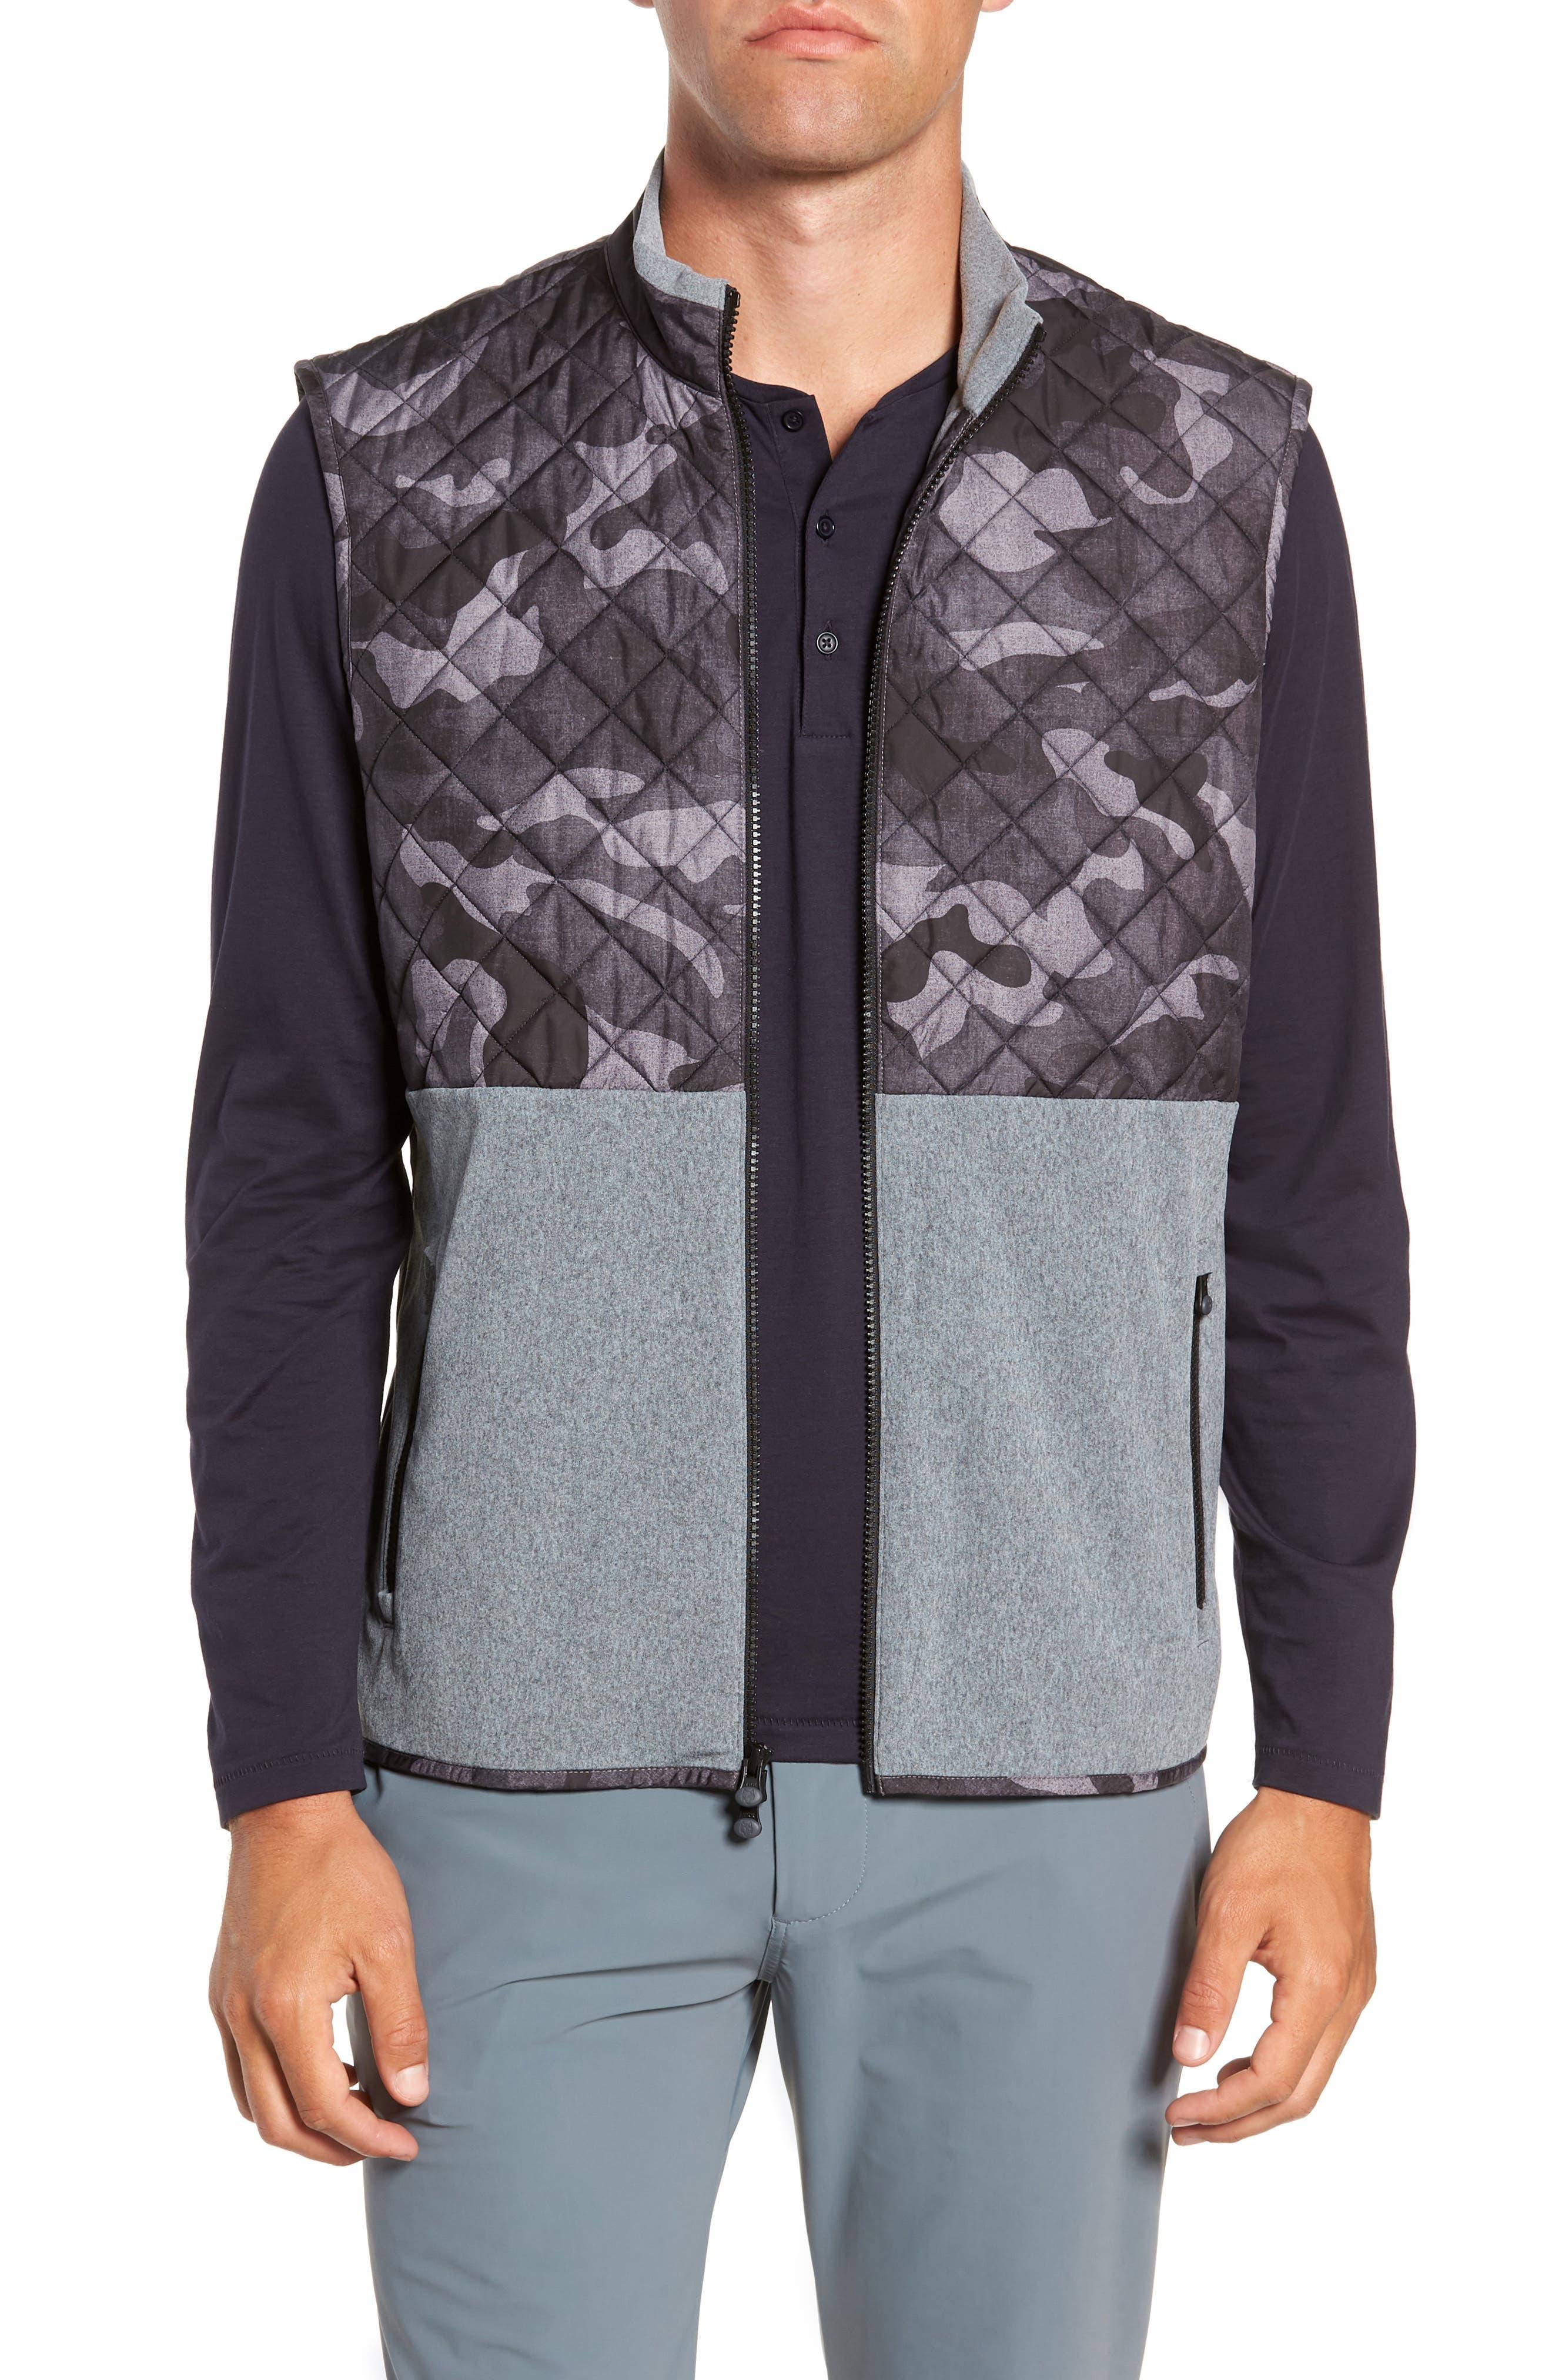 Huron Hybrid Vest,                             Main thumbnail 1, color,                             GREY HEATHER/ GREY CAMO